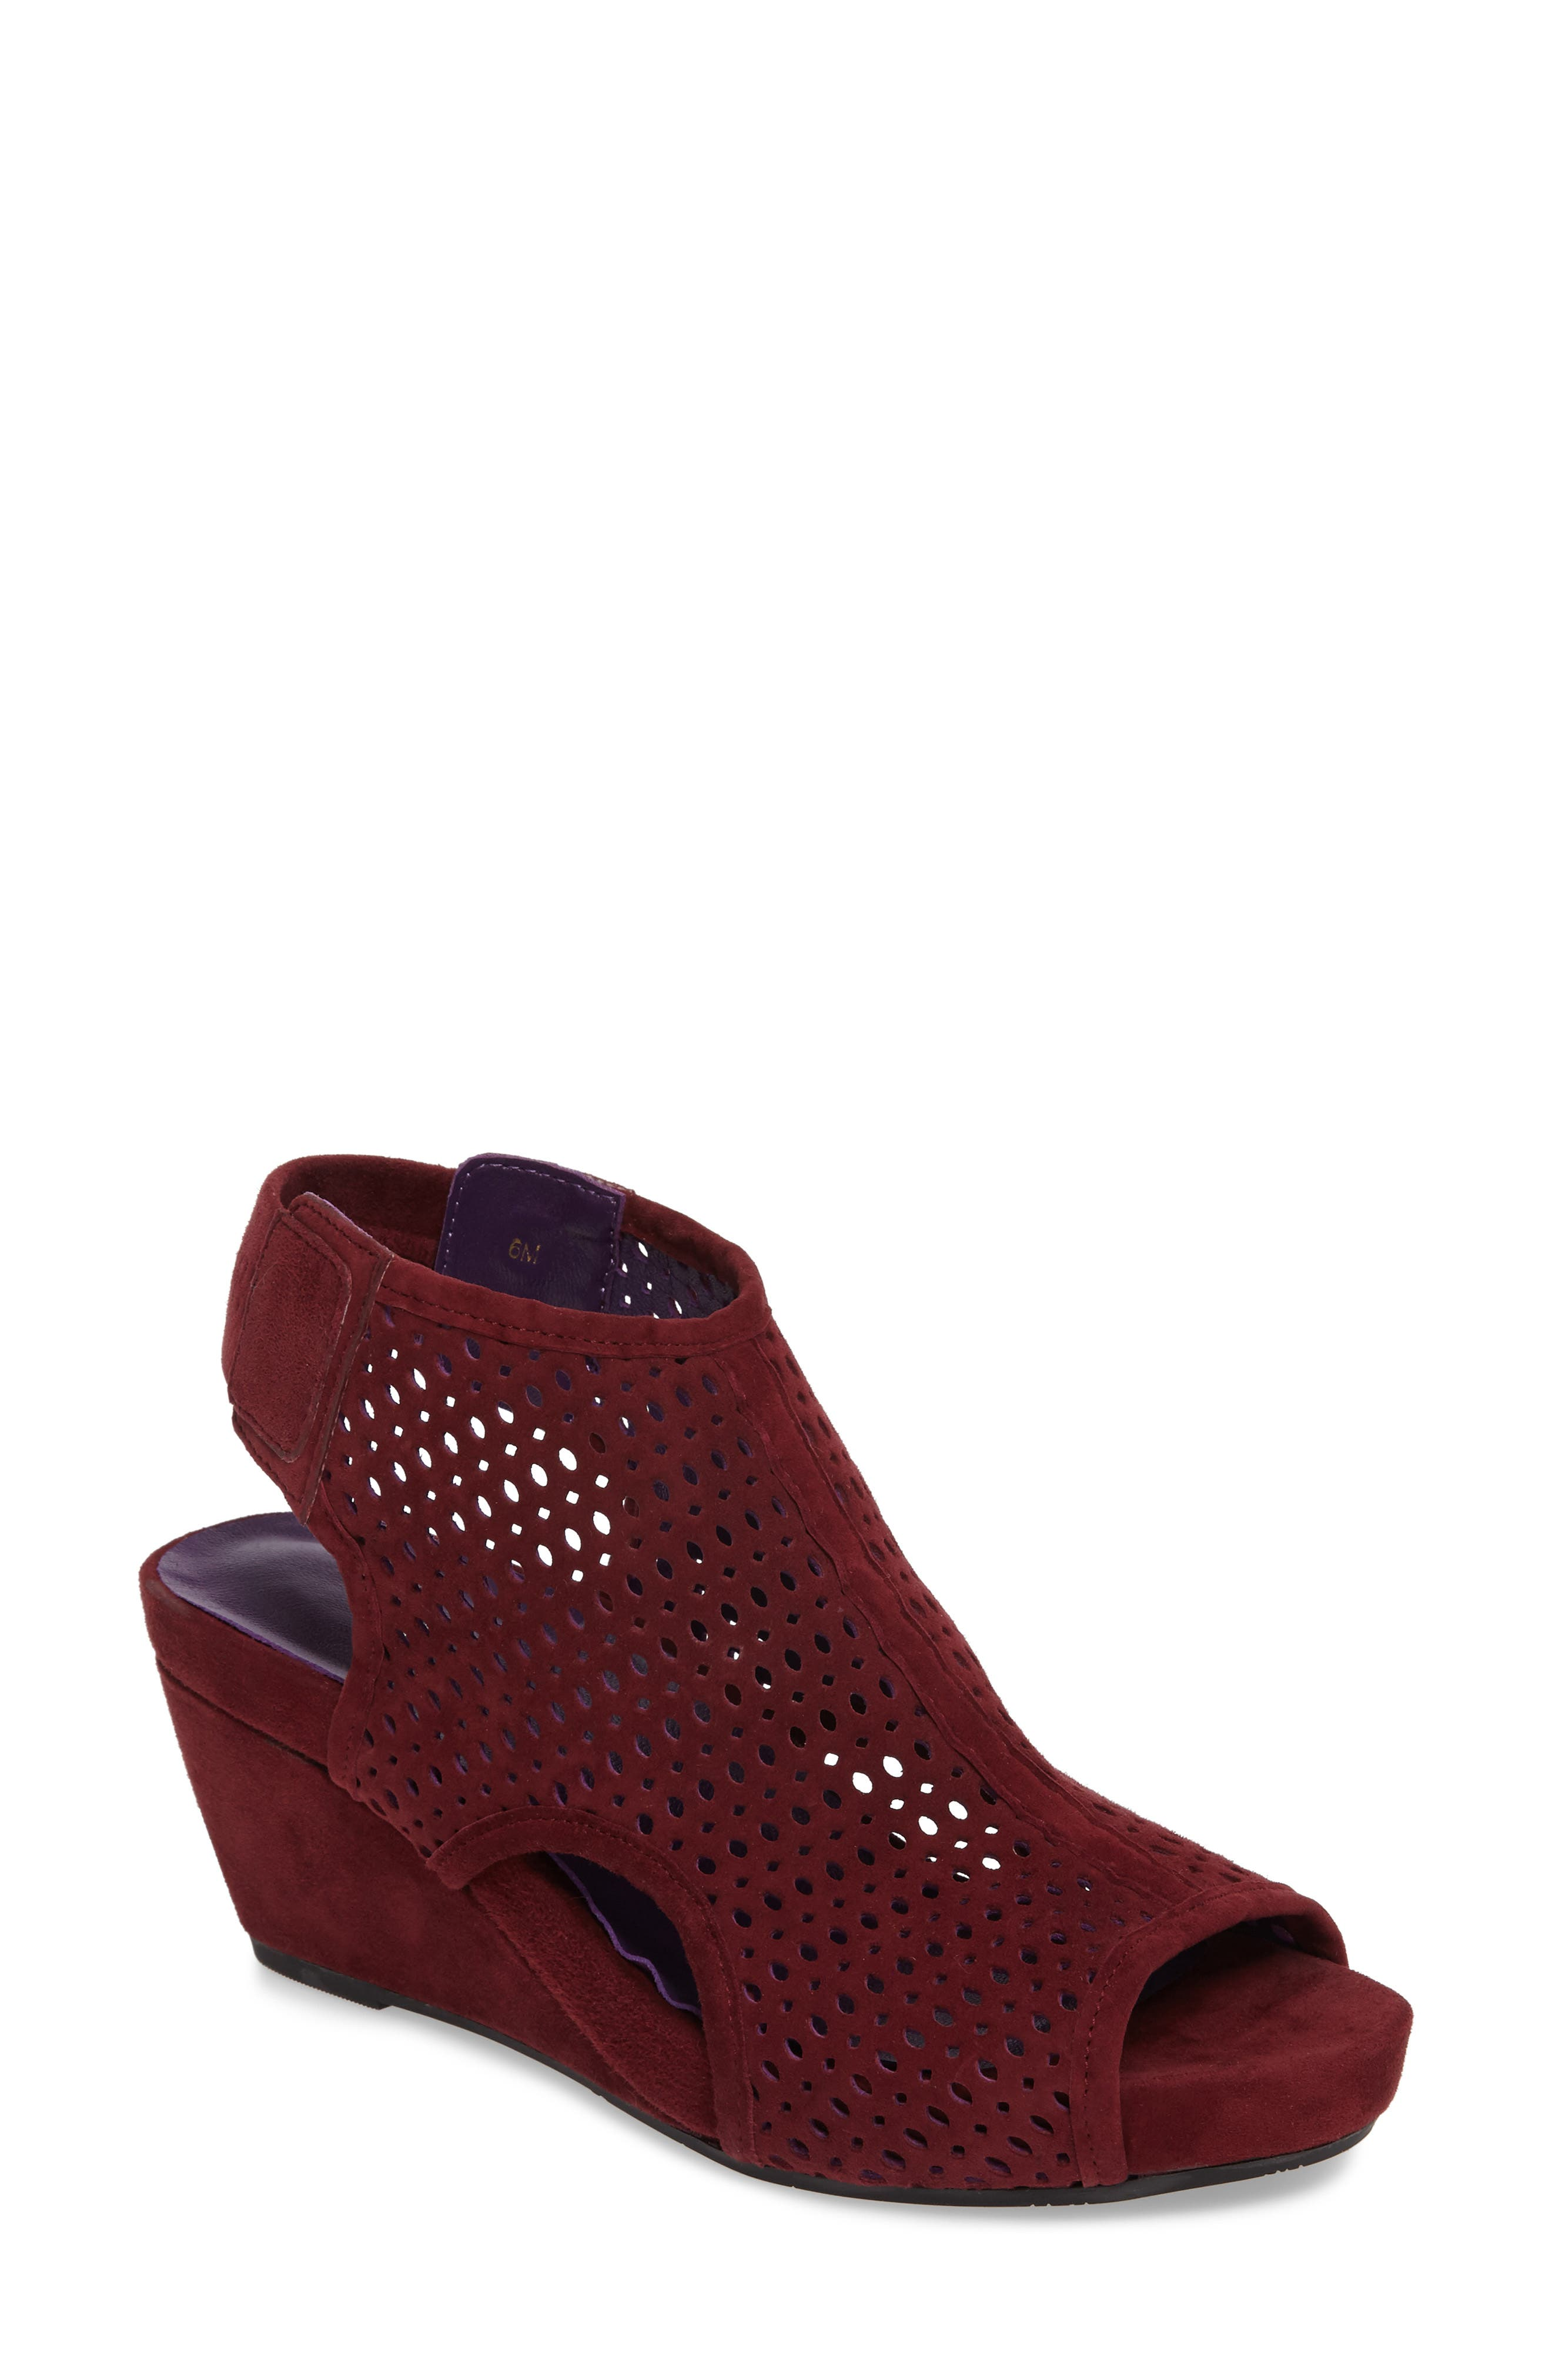 'Inez' Wedge Sandal,                             Main thumbnail 6, color,